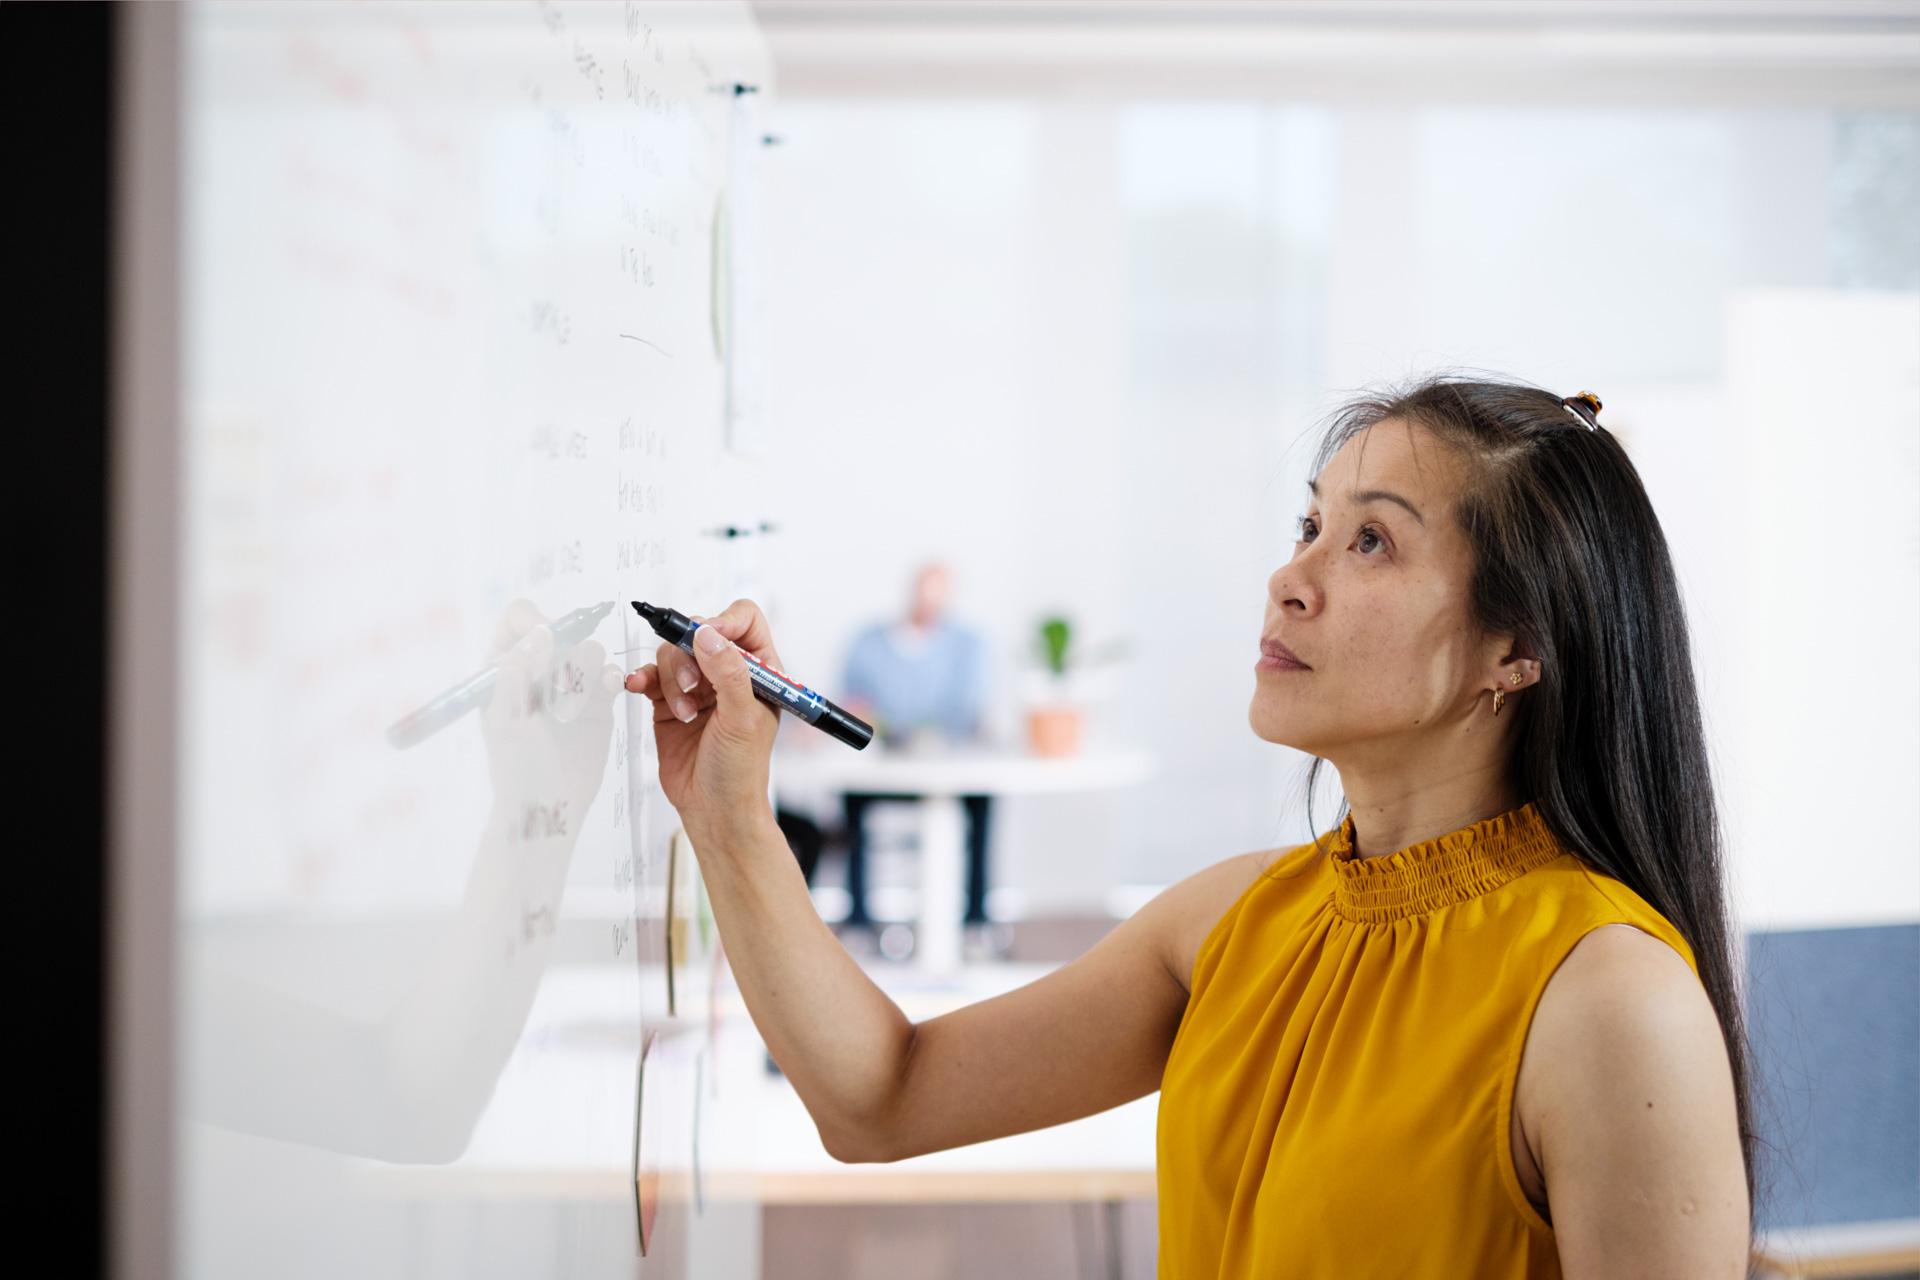 Writing on ThinkingWall Divider